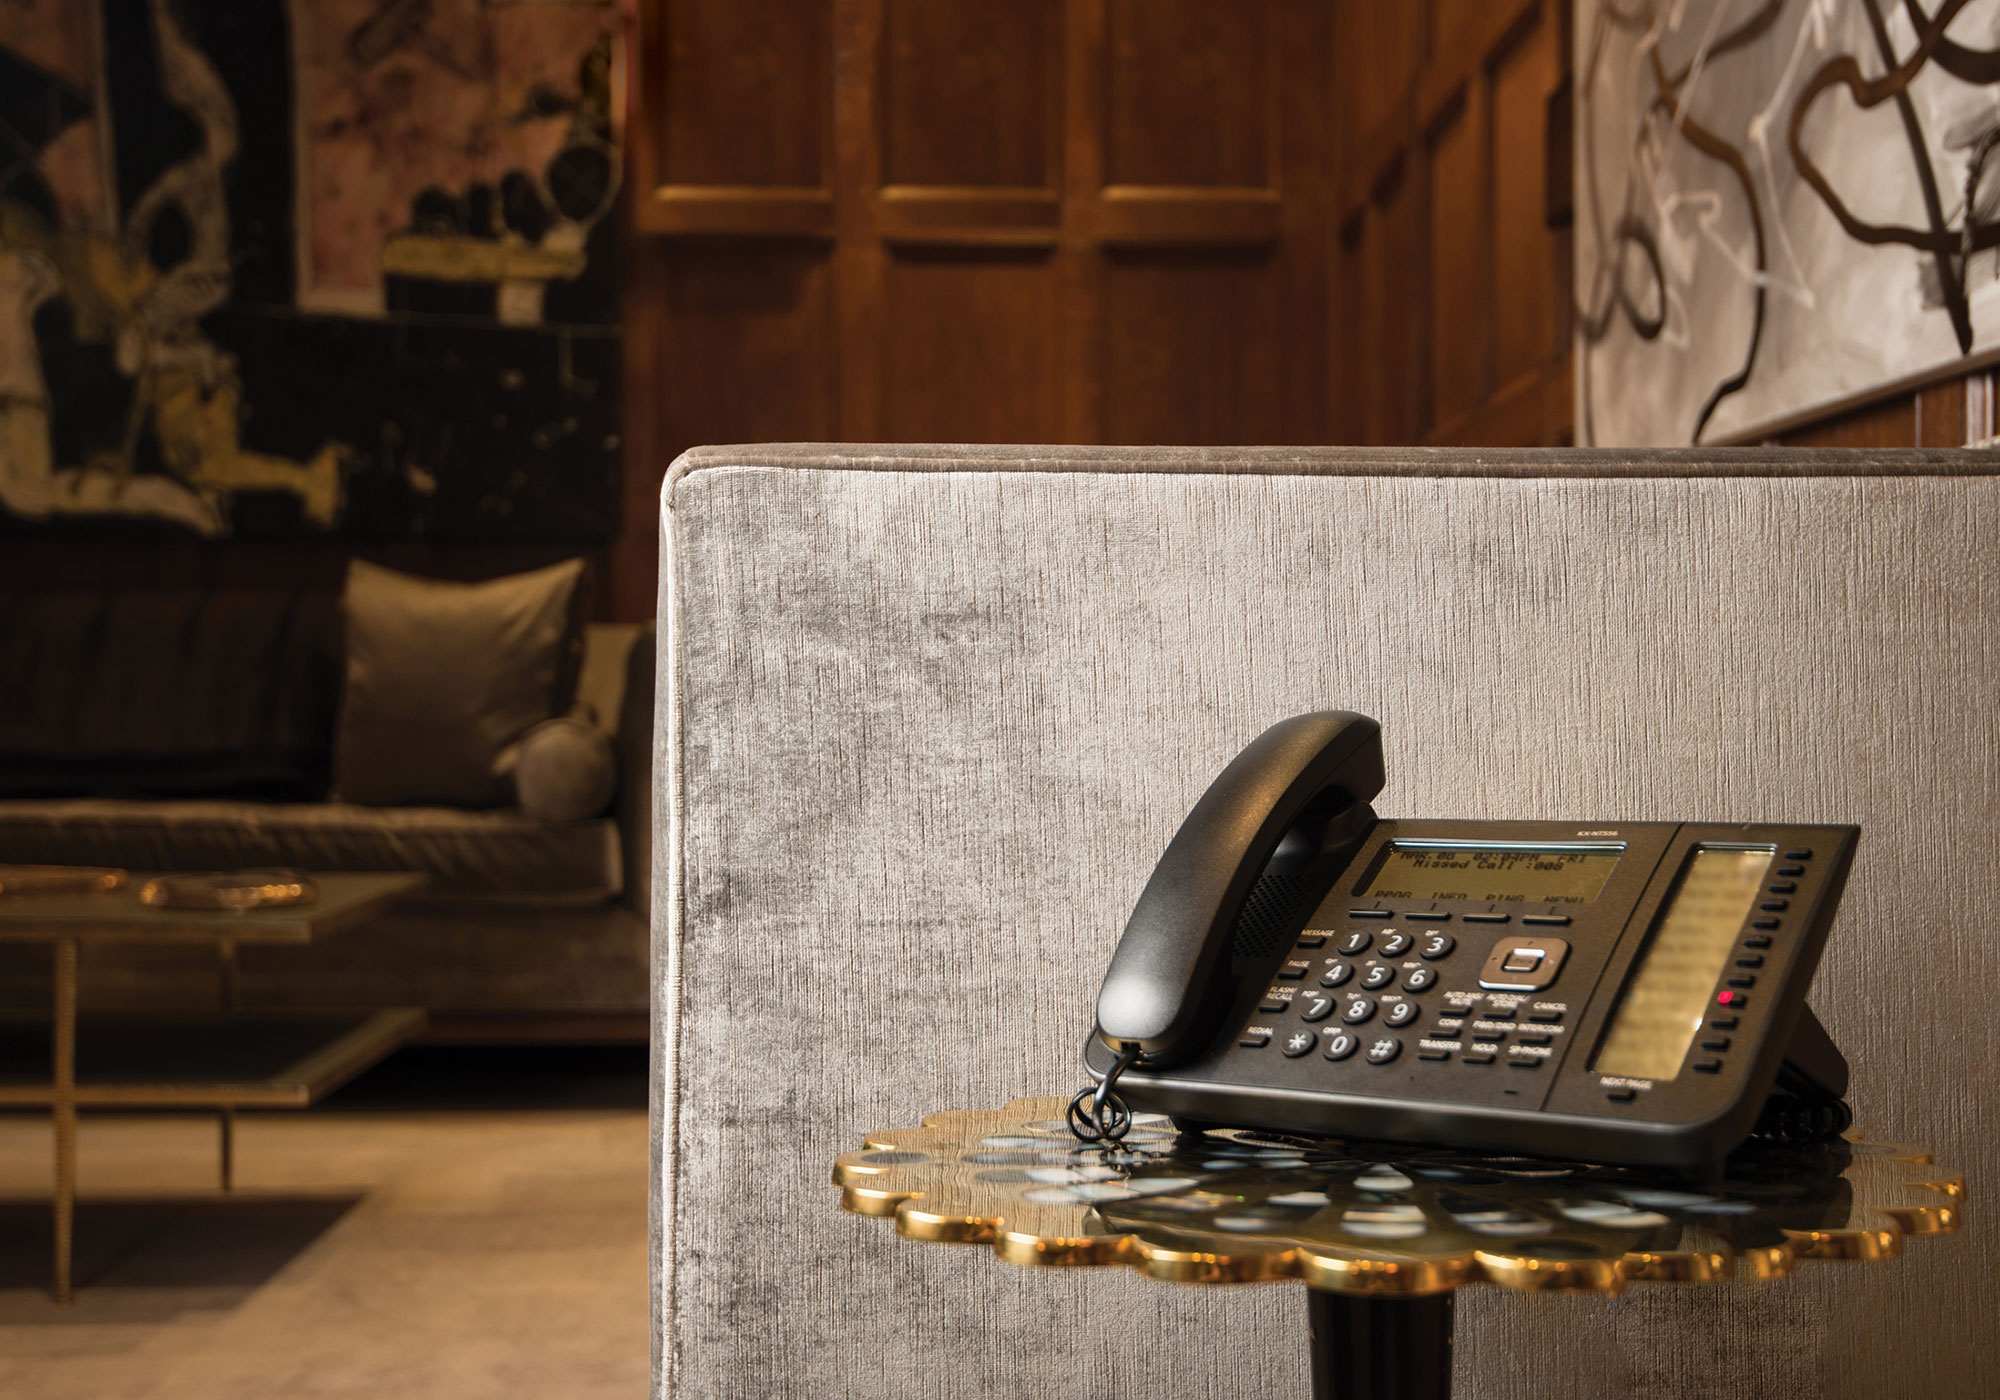 Living Room, telephone